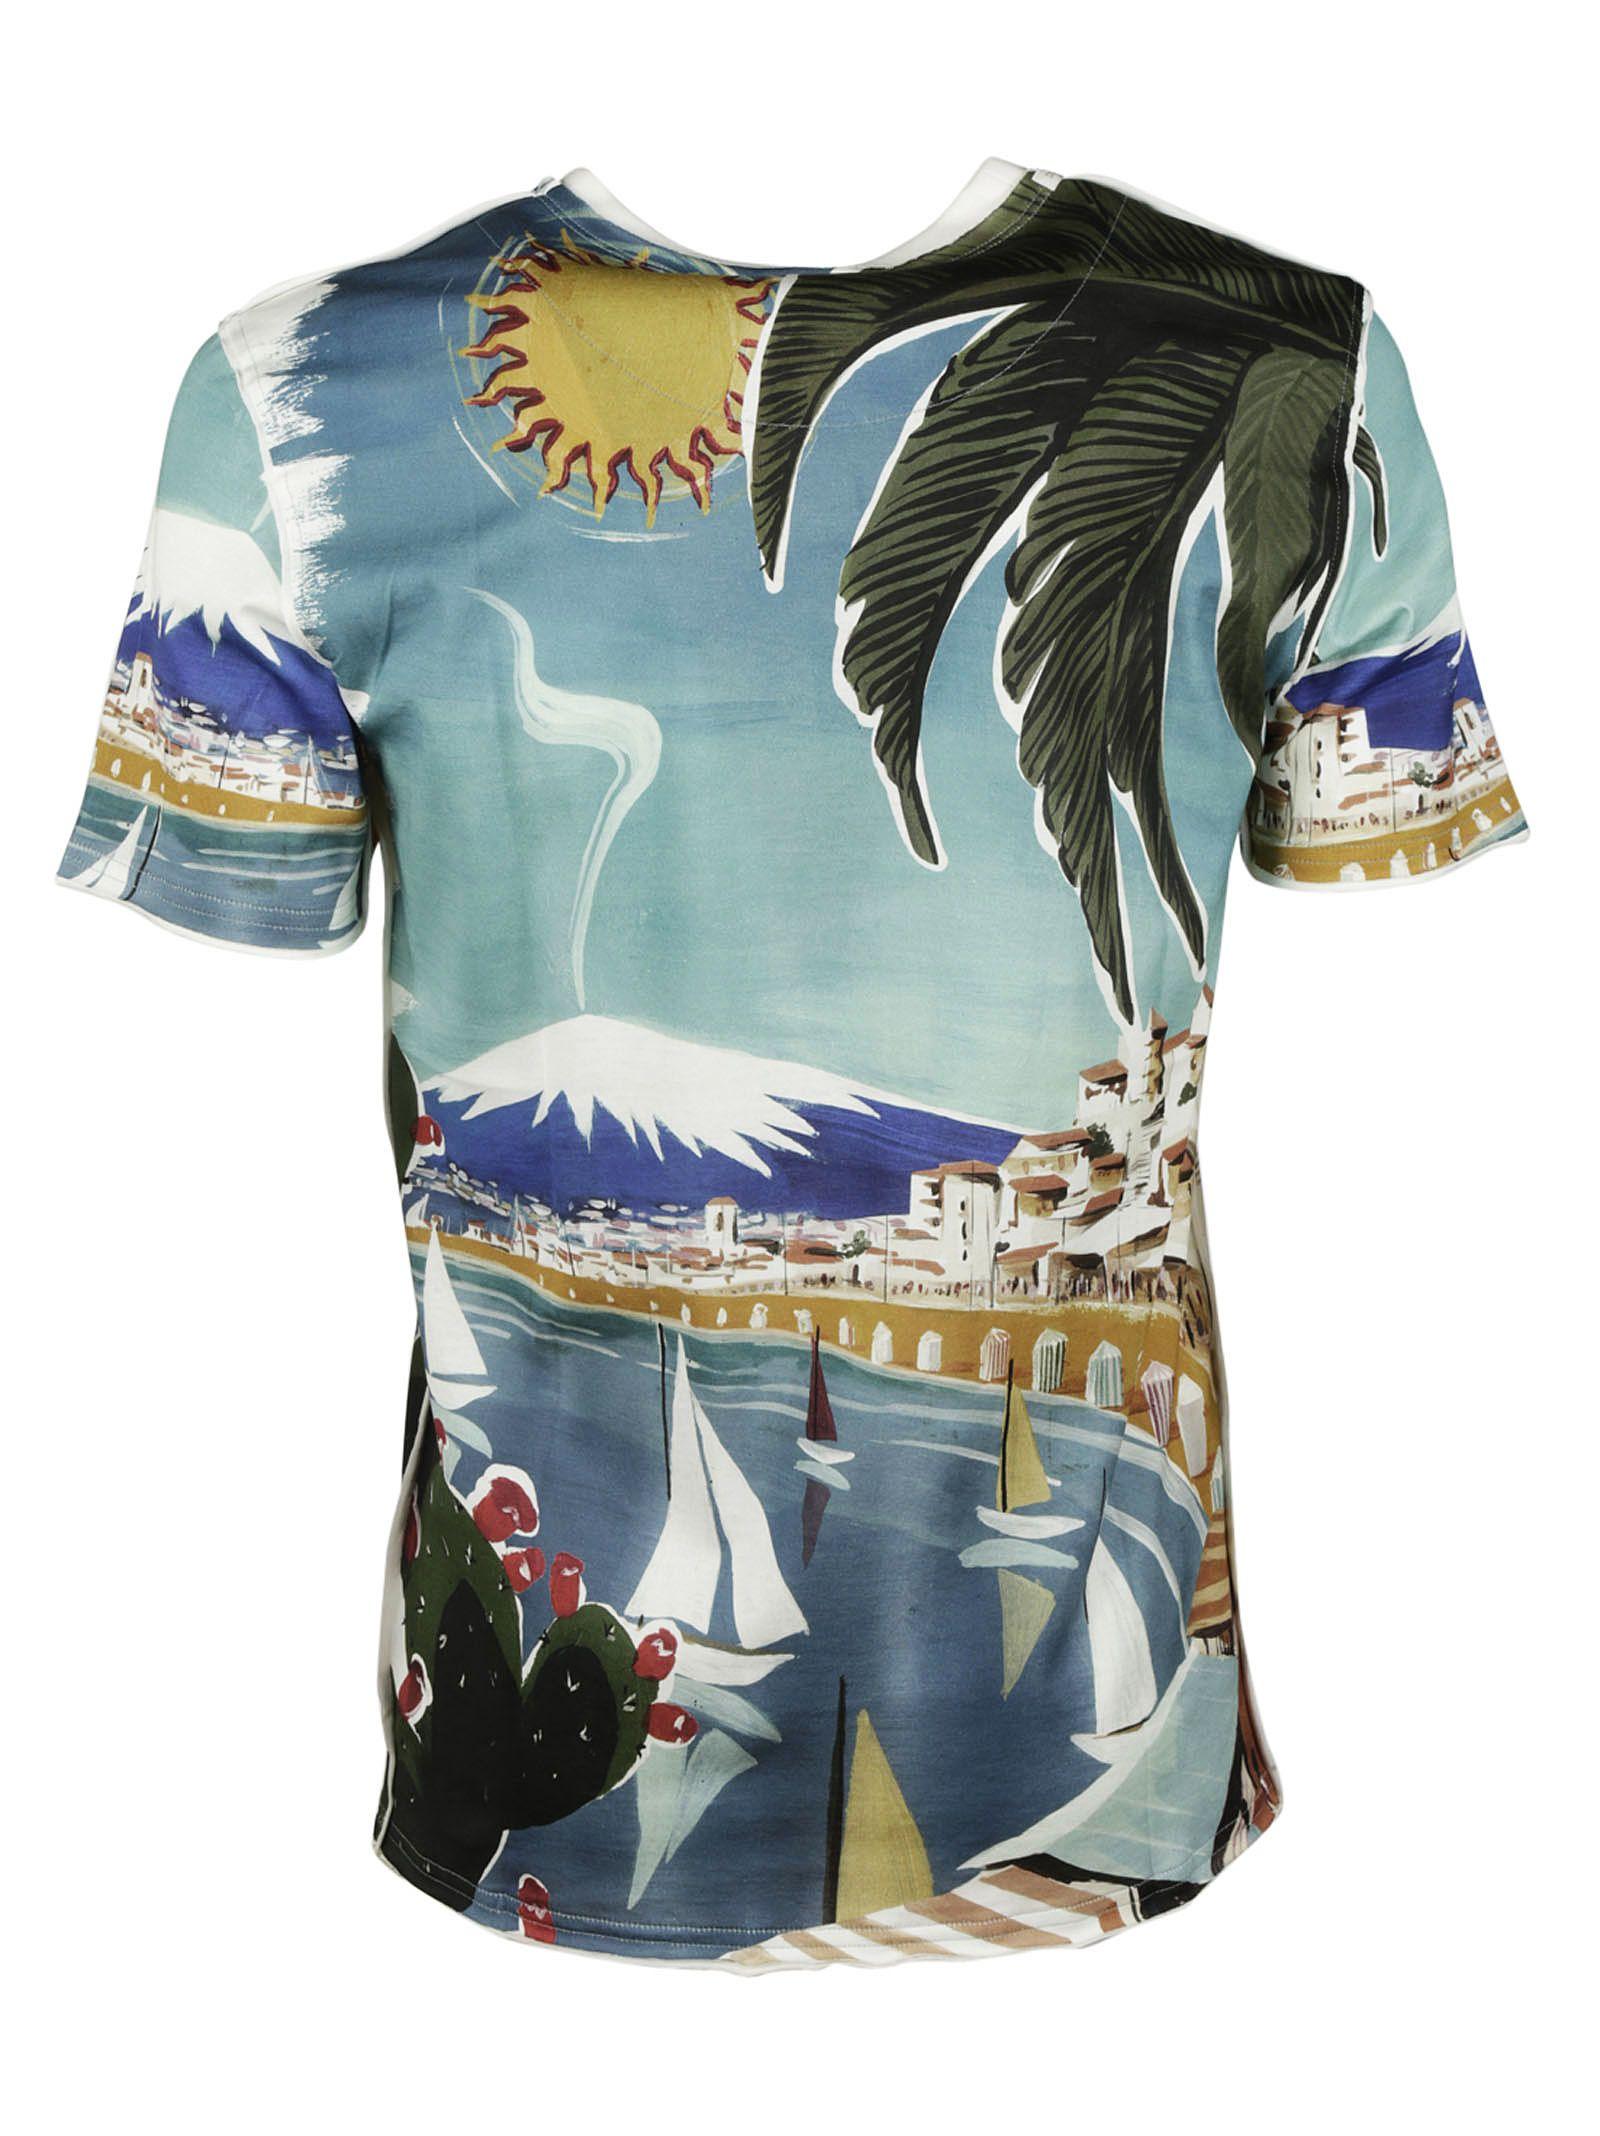 dolce gabbana dolce gabbana catania print t shirt multicolor men 39 s short sleeve t. Black Bedroom Furniture Sets. Home Design Ideas